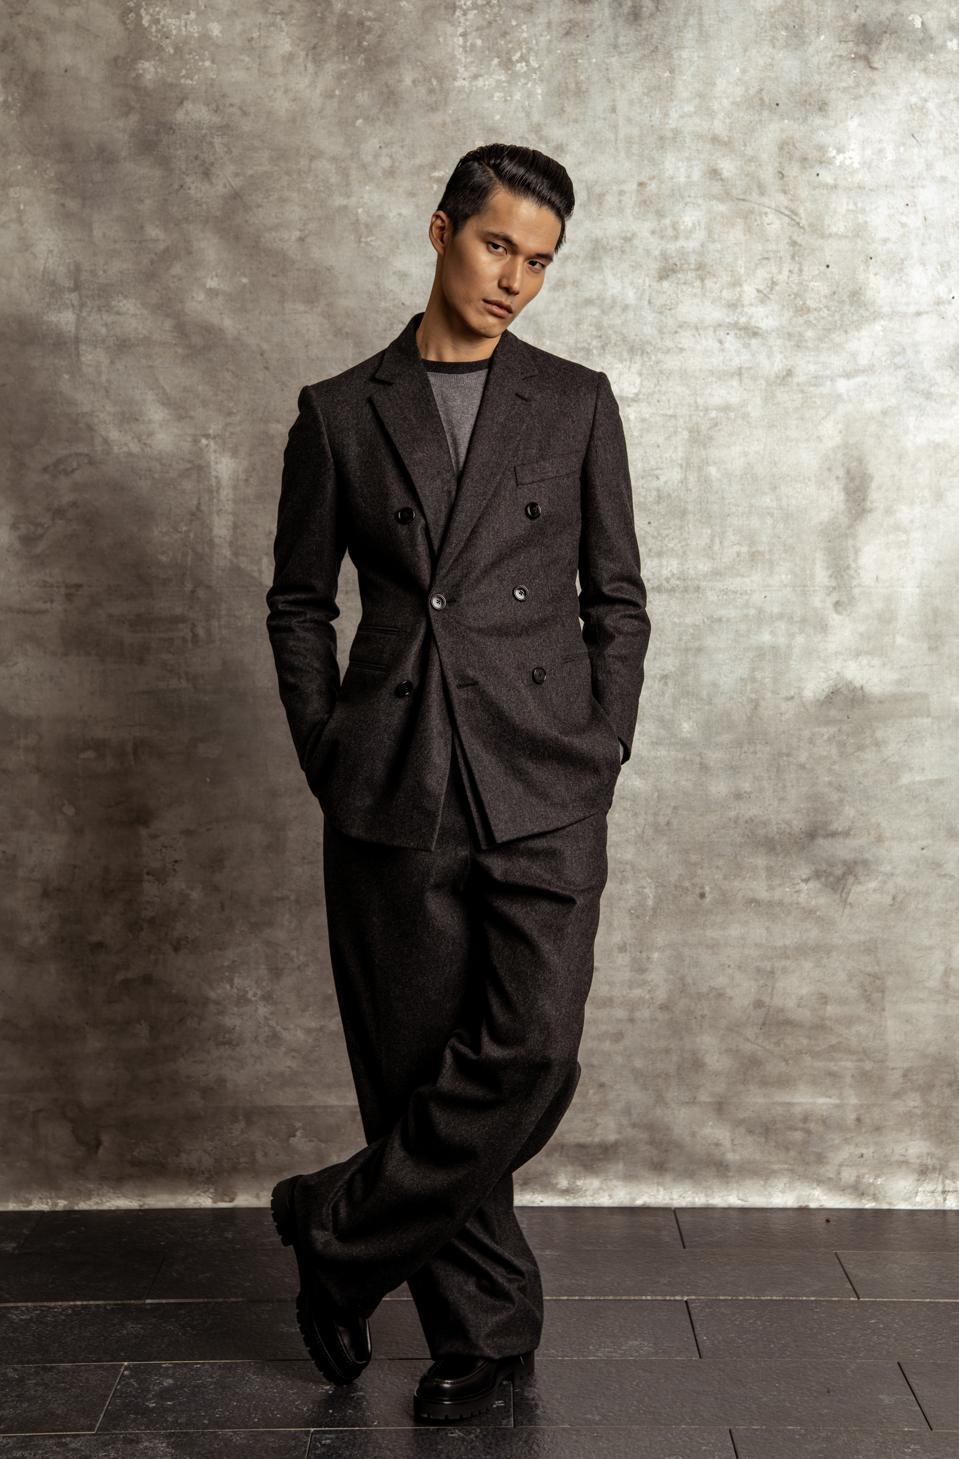 Hermès   Prices & descriptions for Look 1:  Wool flannel suit $5,100; Cashmere sweater $1,275; Boots $1,150   Prices & descriptions for Look 2:  Deerskin hooded sweatshirt $12,800; Cashmere sweater $1,275; Boots $1,150; Wool flannel pants sold as suit - $5,100   https://www.hermes.com/us/en/    @hermes